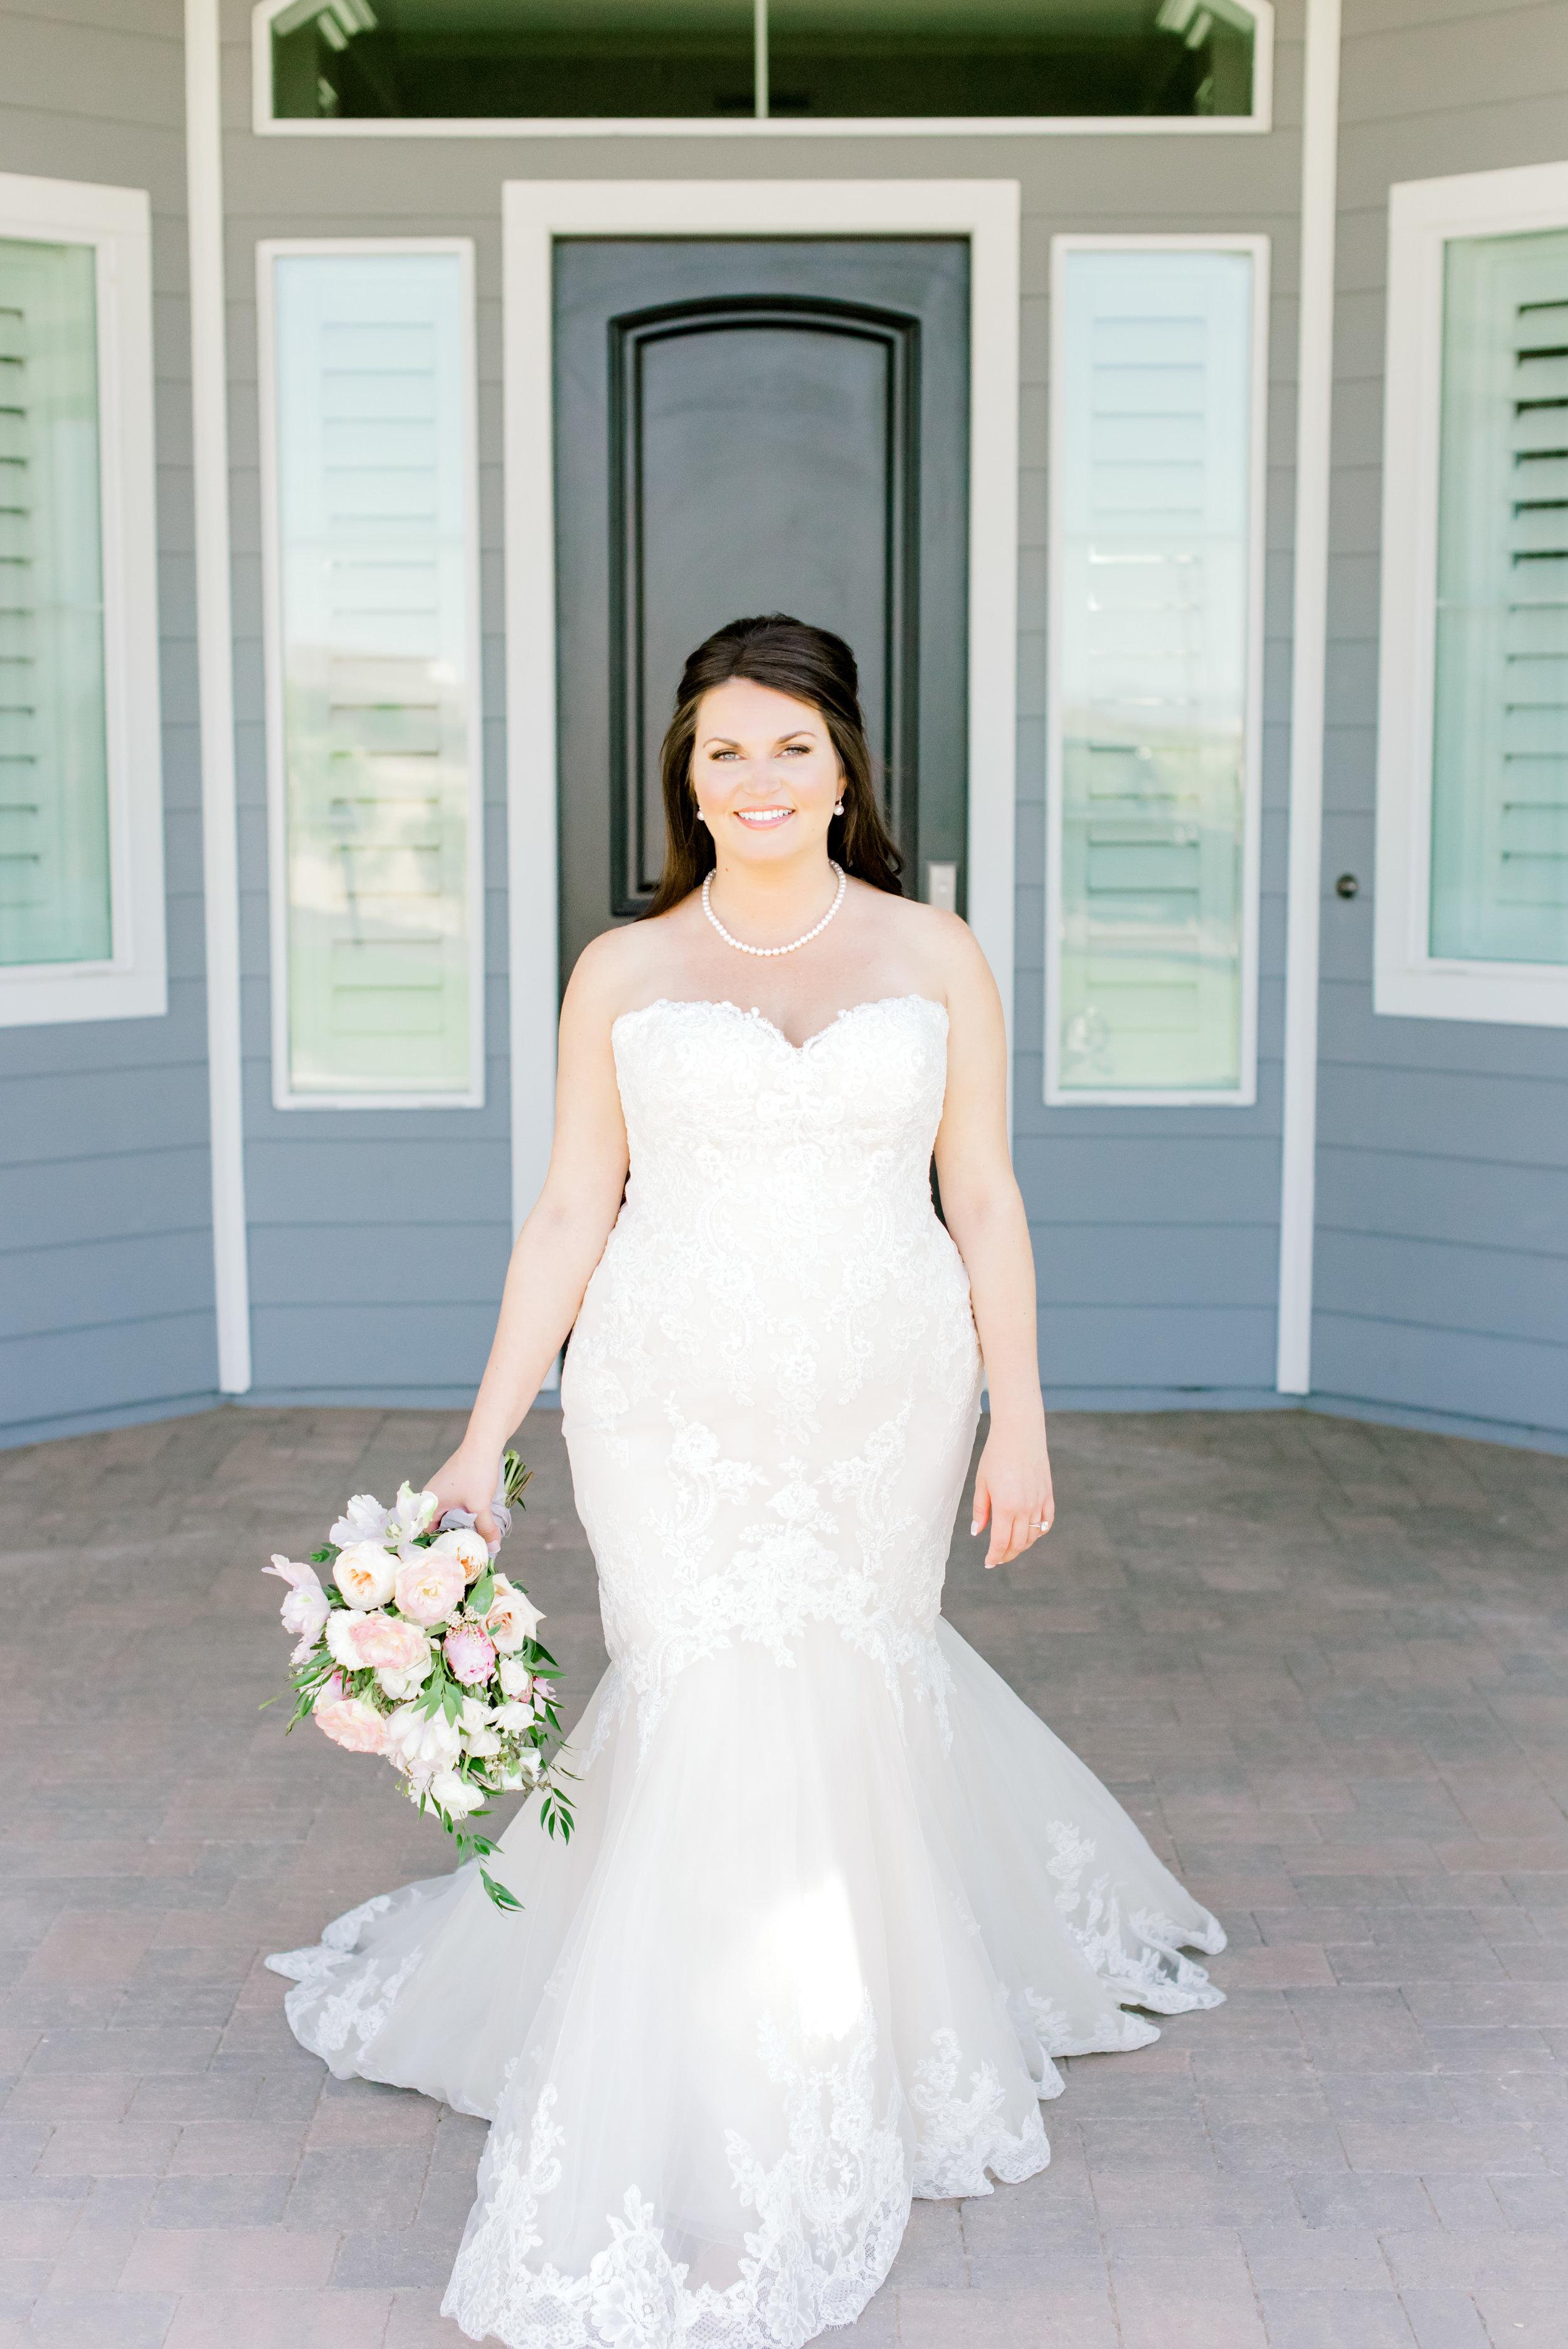 Blush and white backyard wedding - Bridal Portraits